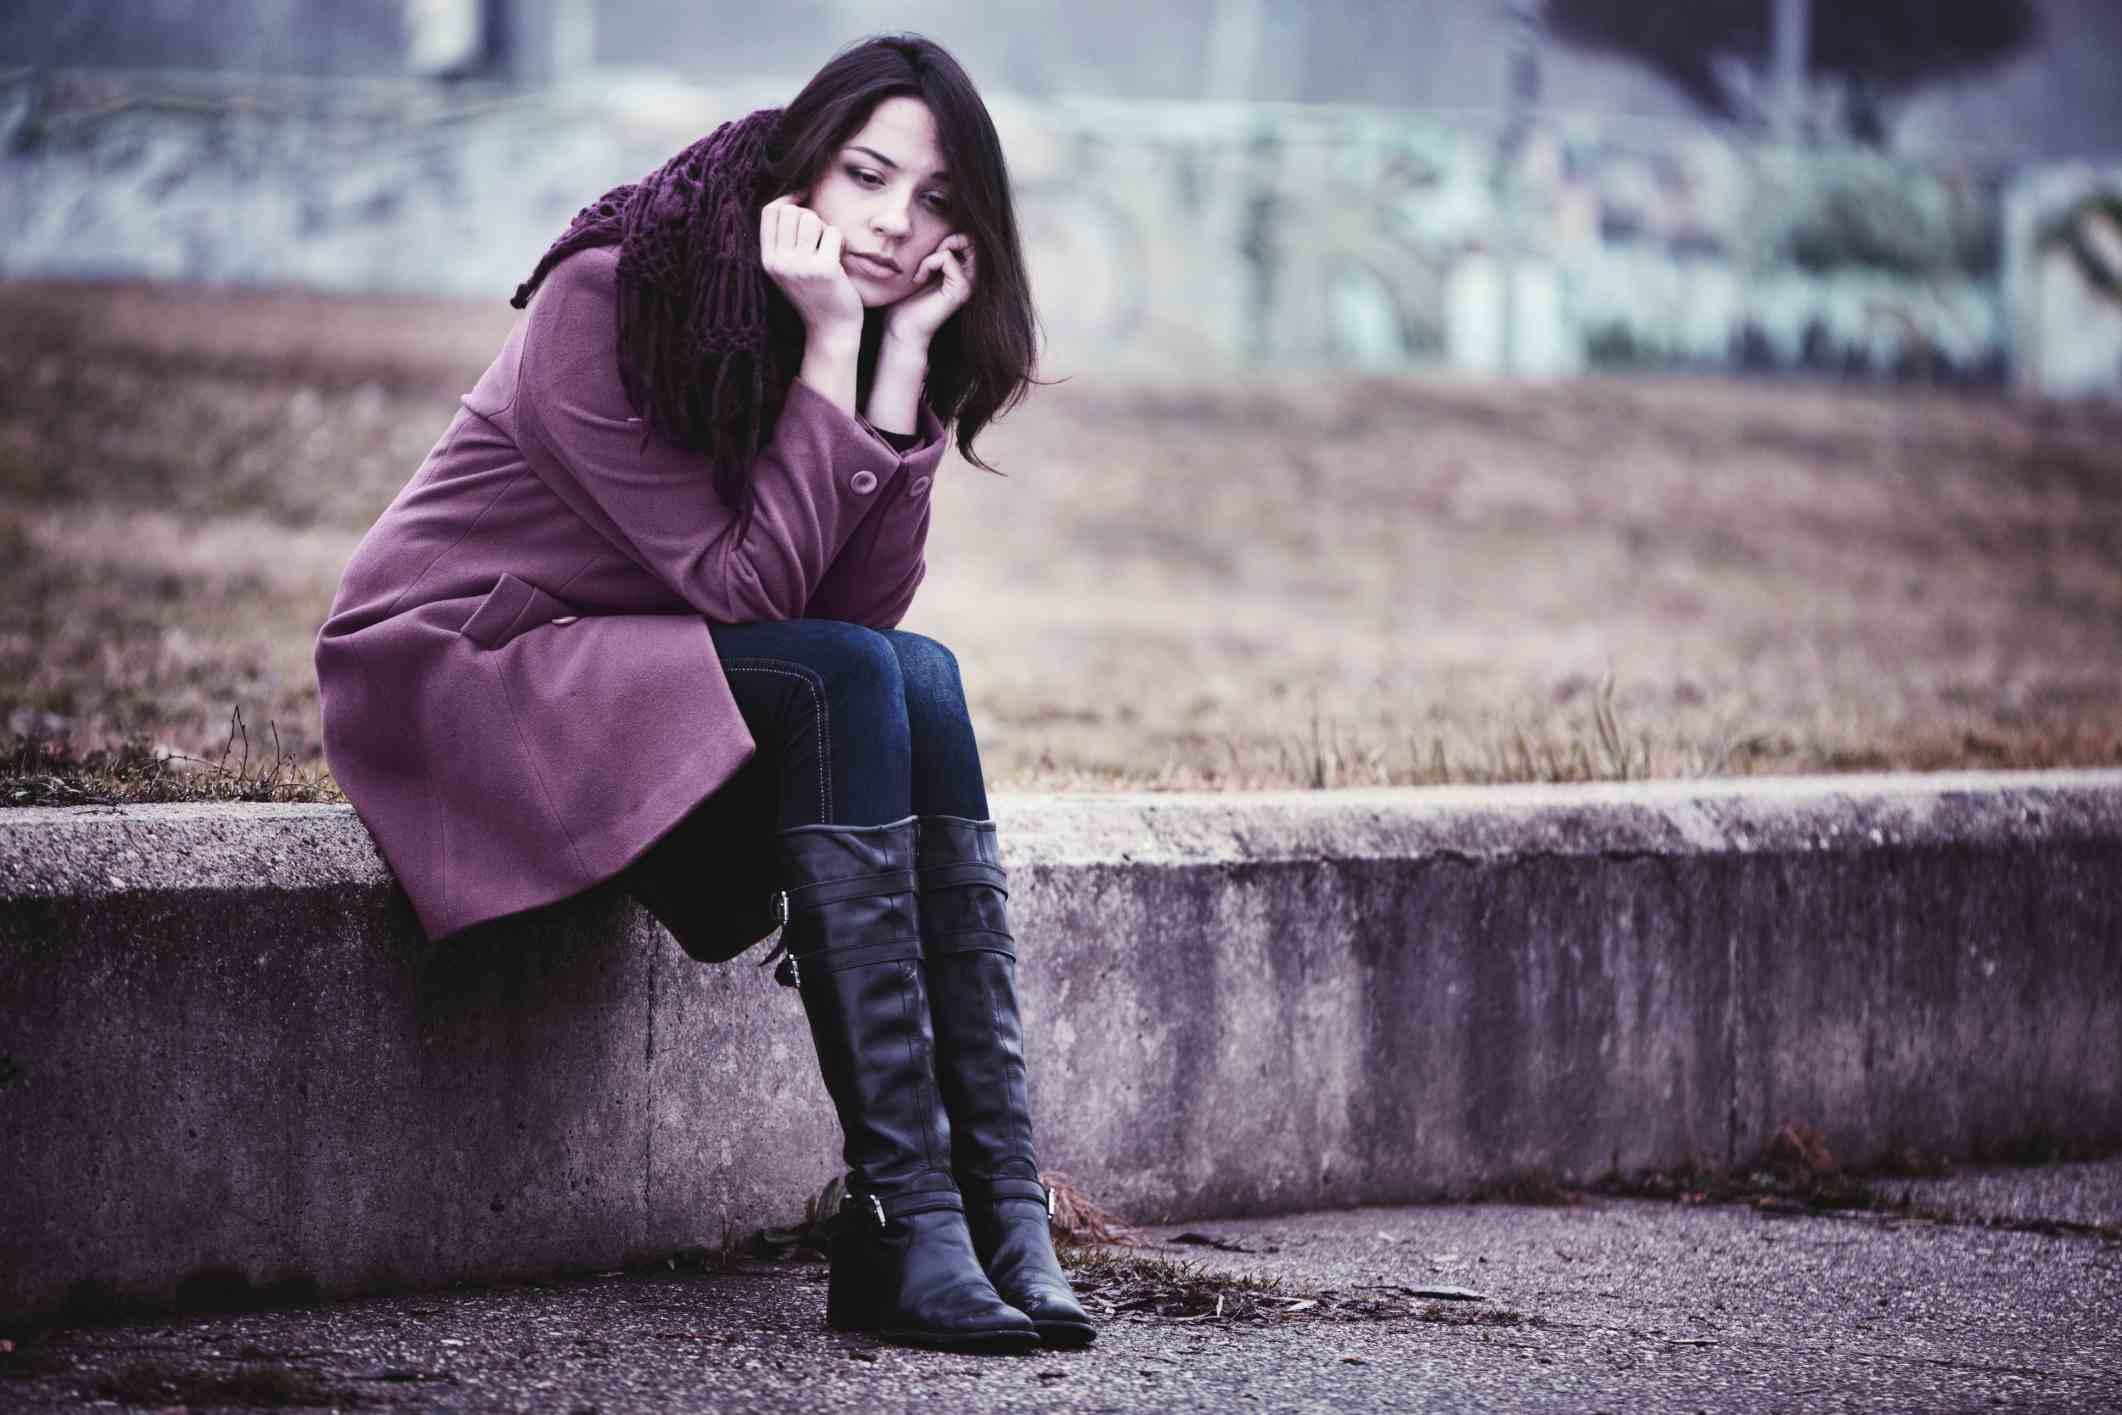 lonely-girl-by-wall-sitting-AlexanderNovikov.jpg